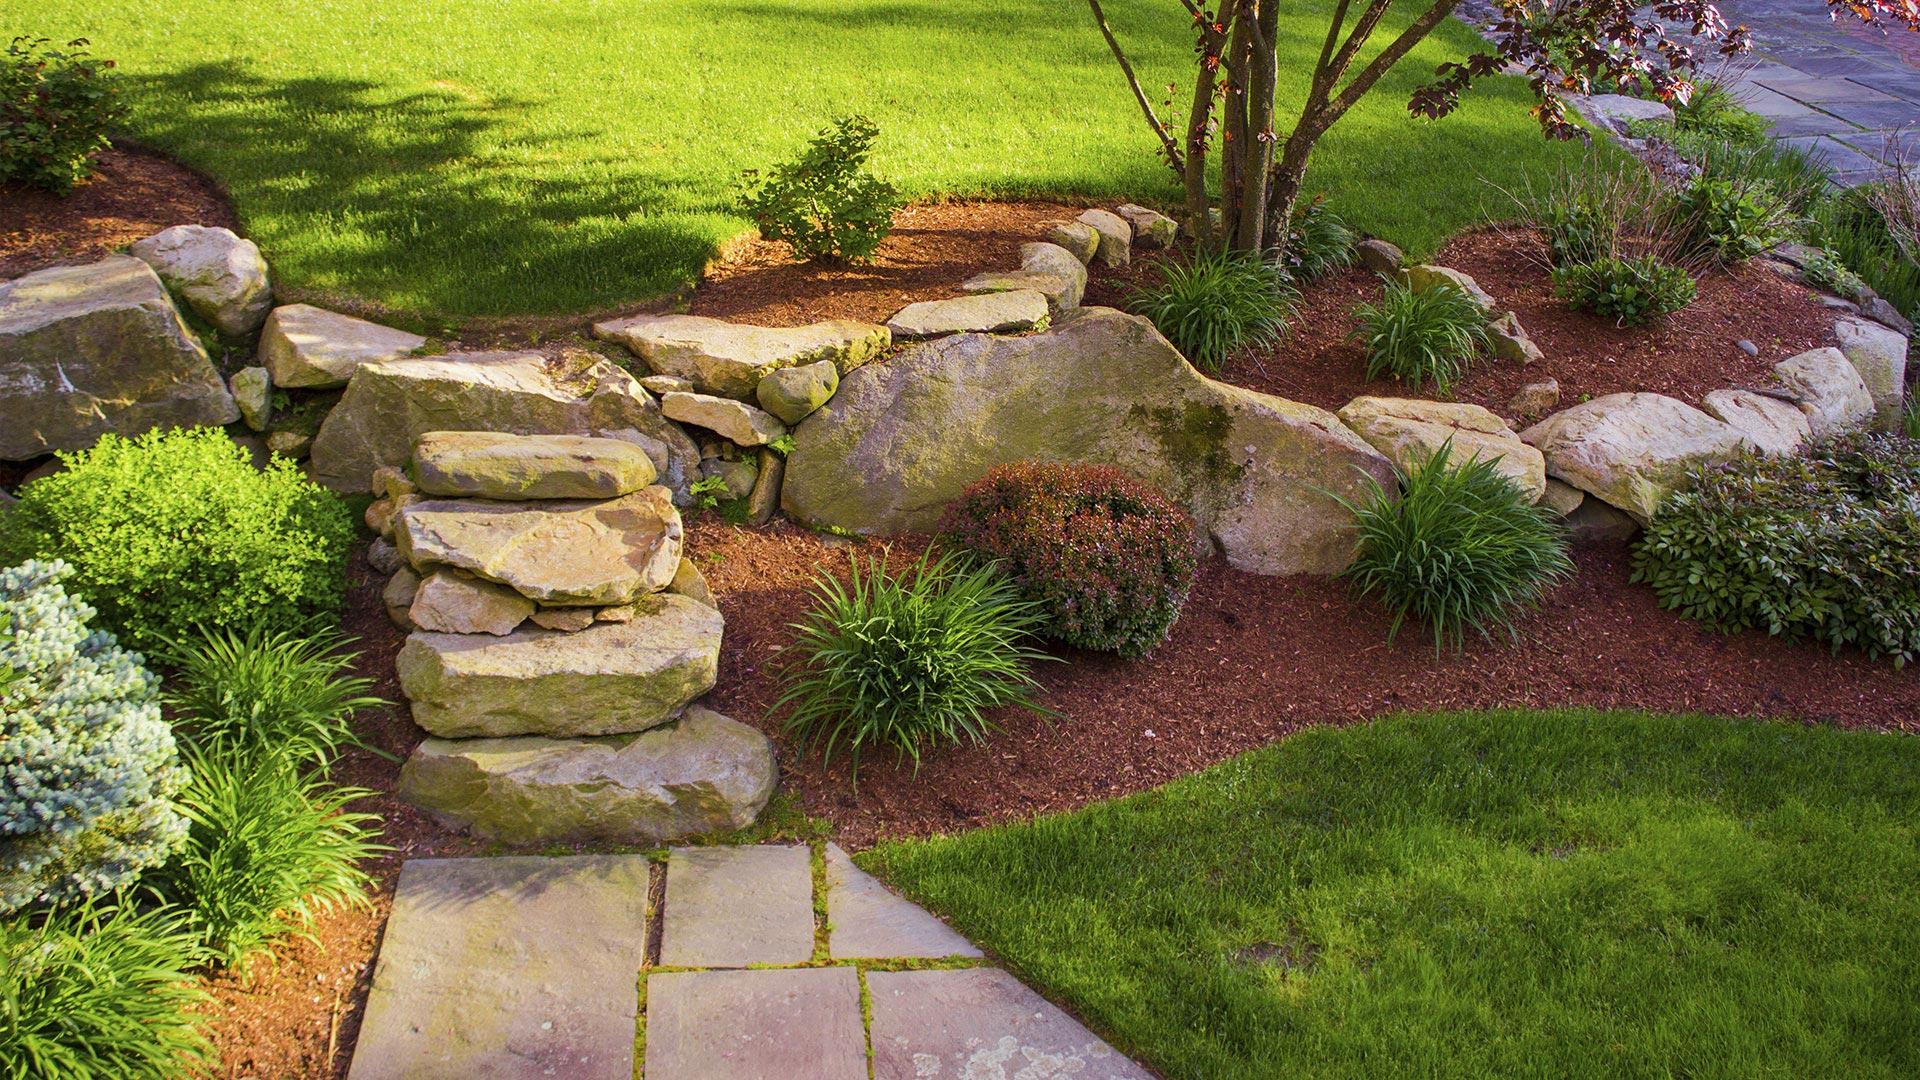 CLM Landscaping LLC Landscaping Company, Landscaper and Landscaping Services slide 3